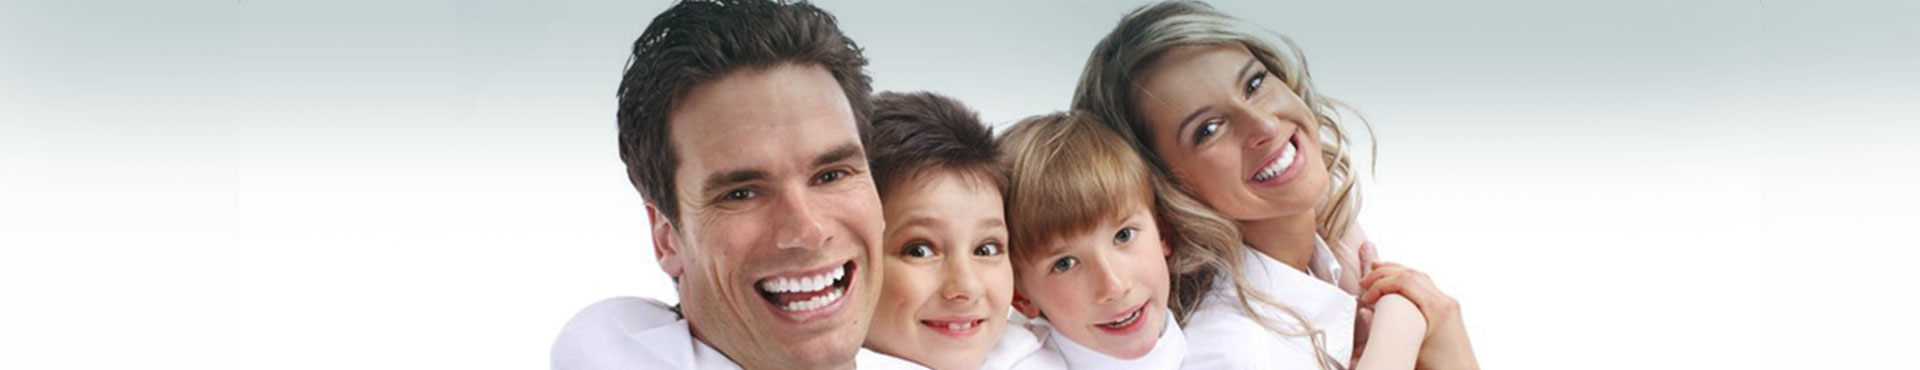 CEOSPI - Centro de Ensino Odontológico Smile Odonto